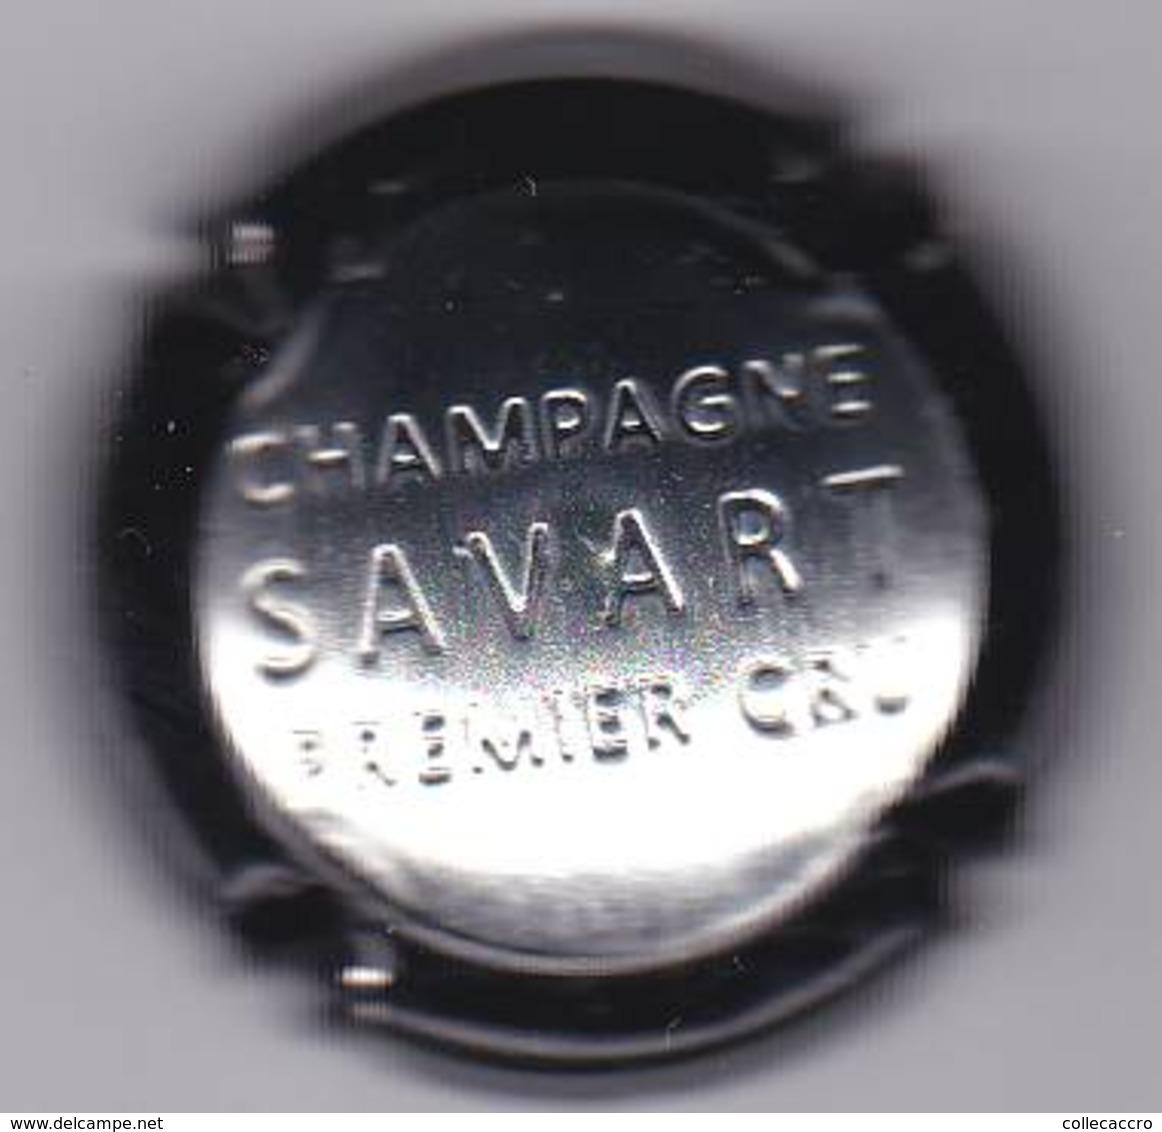 SAVART N°45d - Champagne